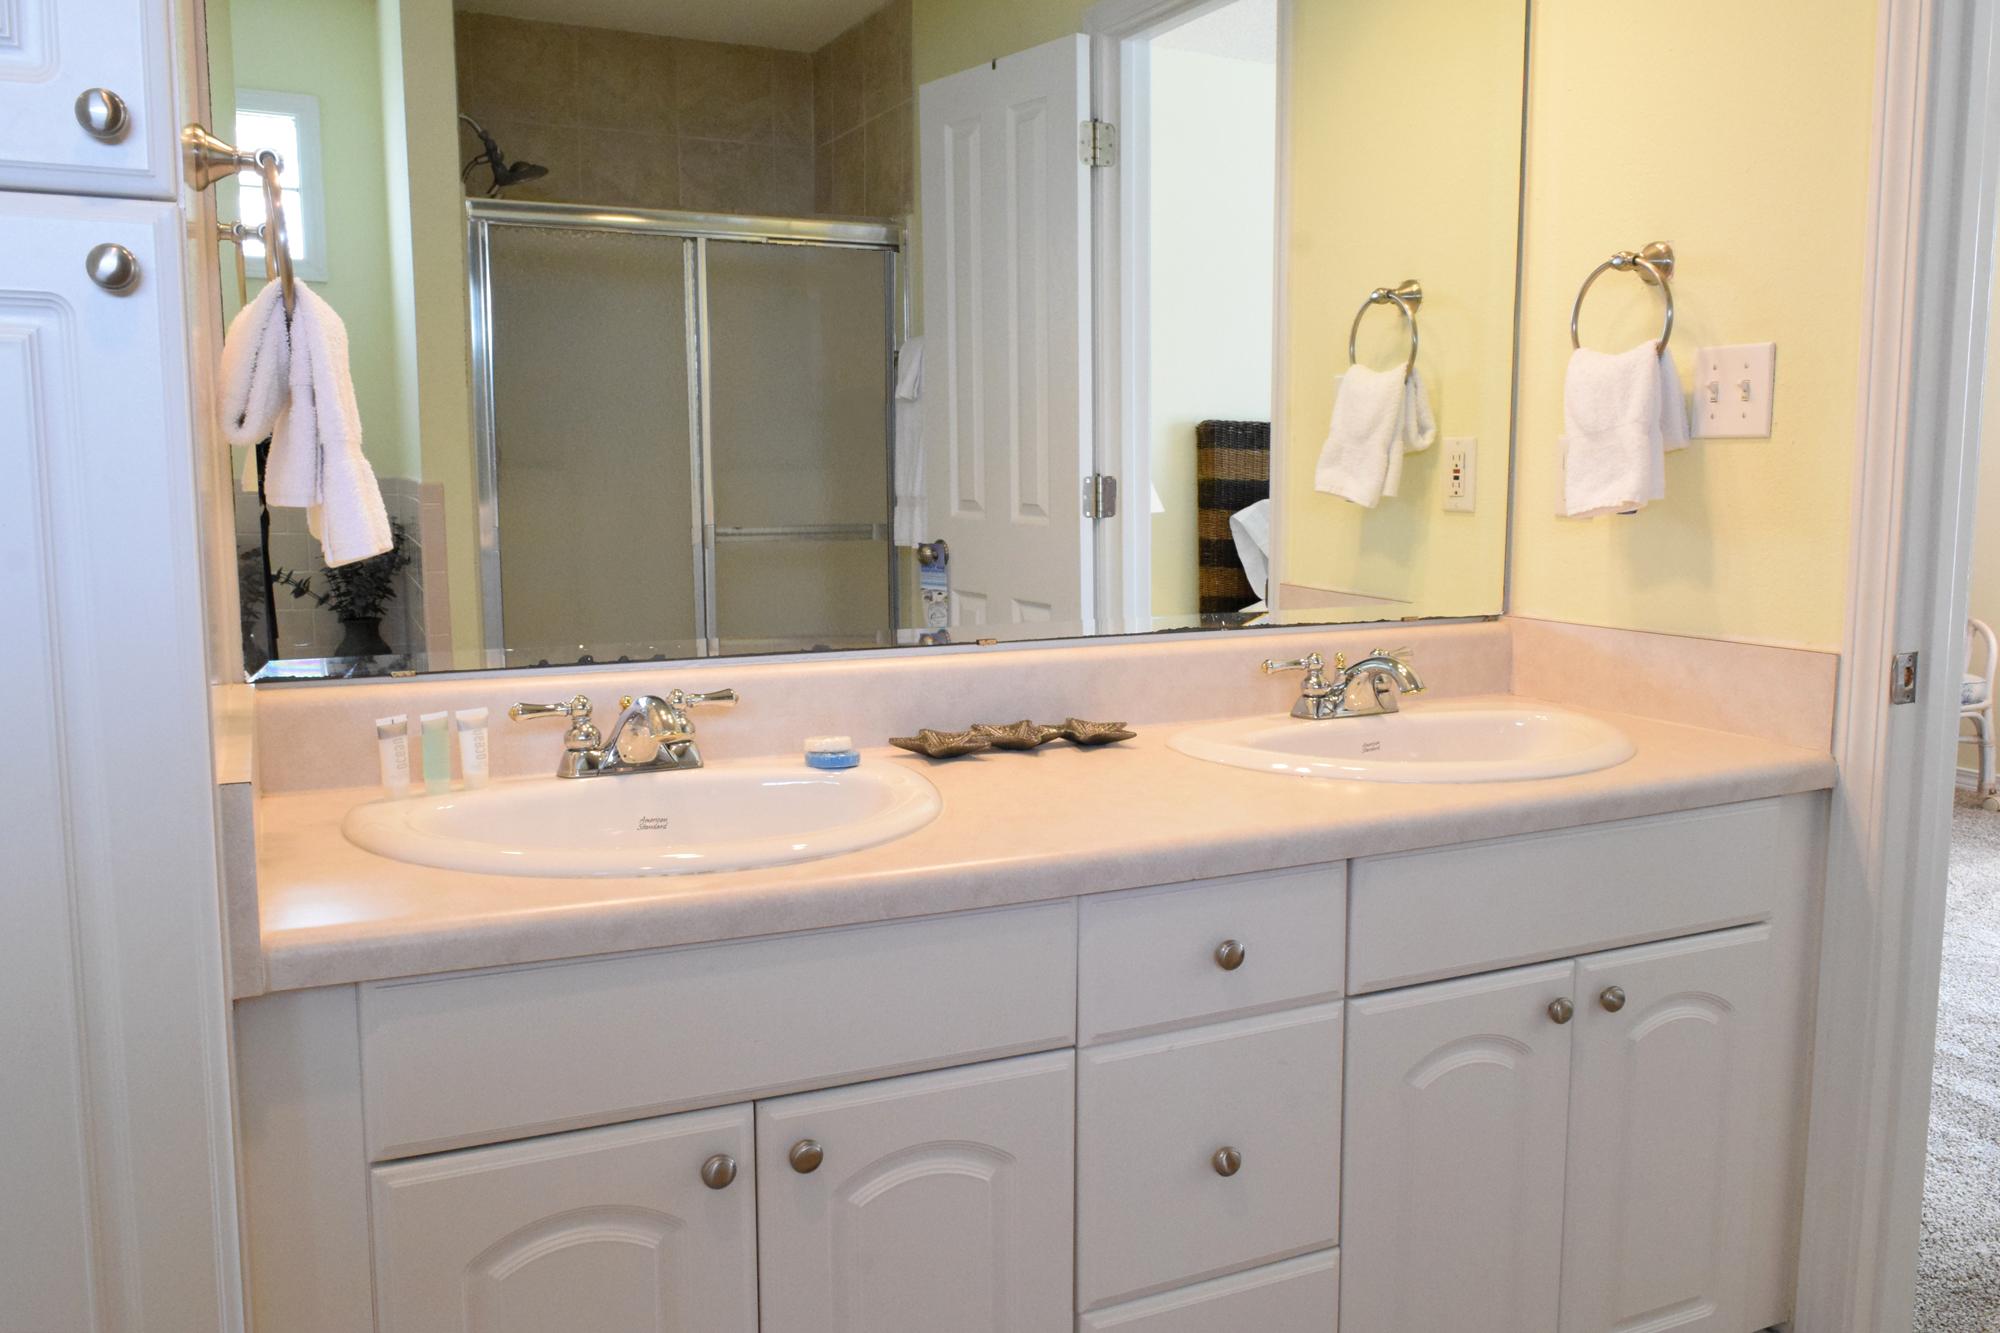 Maldonado 1103 House/Cottage rental in Pensacola Beach House Rentals in Pensacola Beach Florida - #14